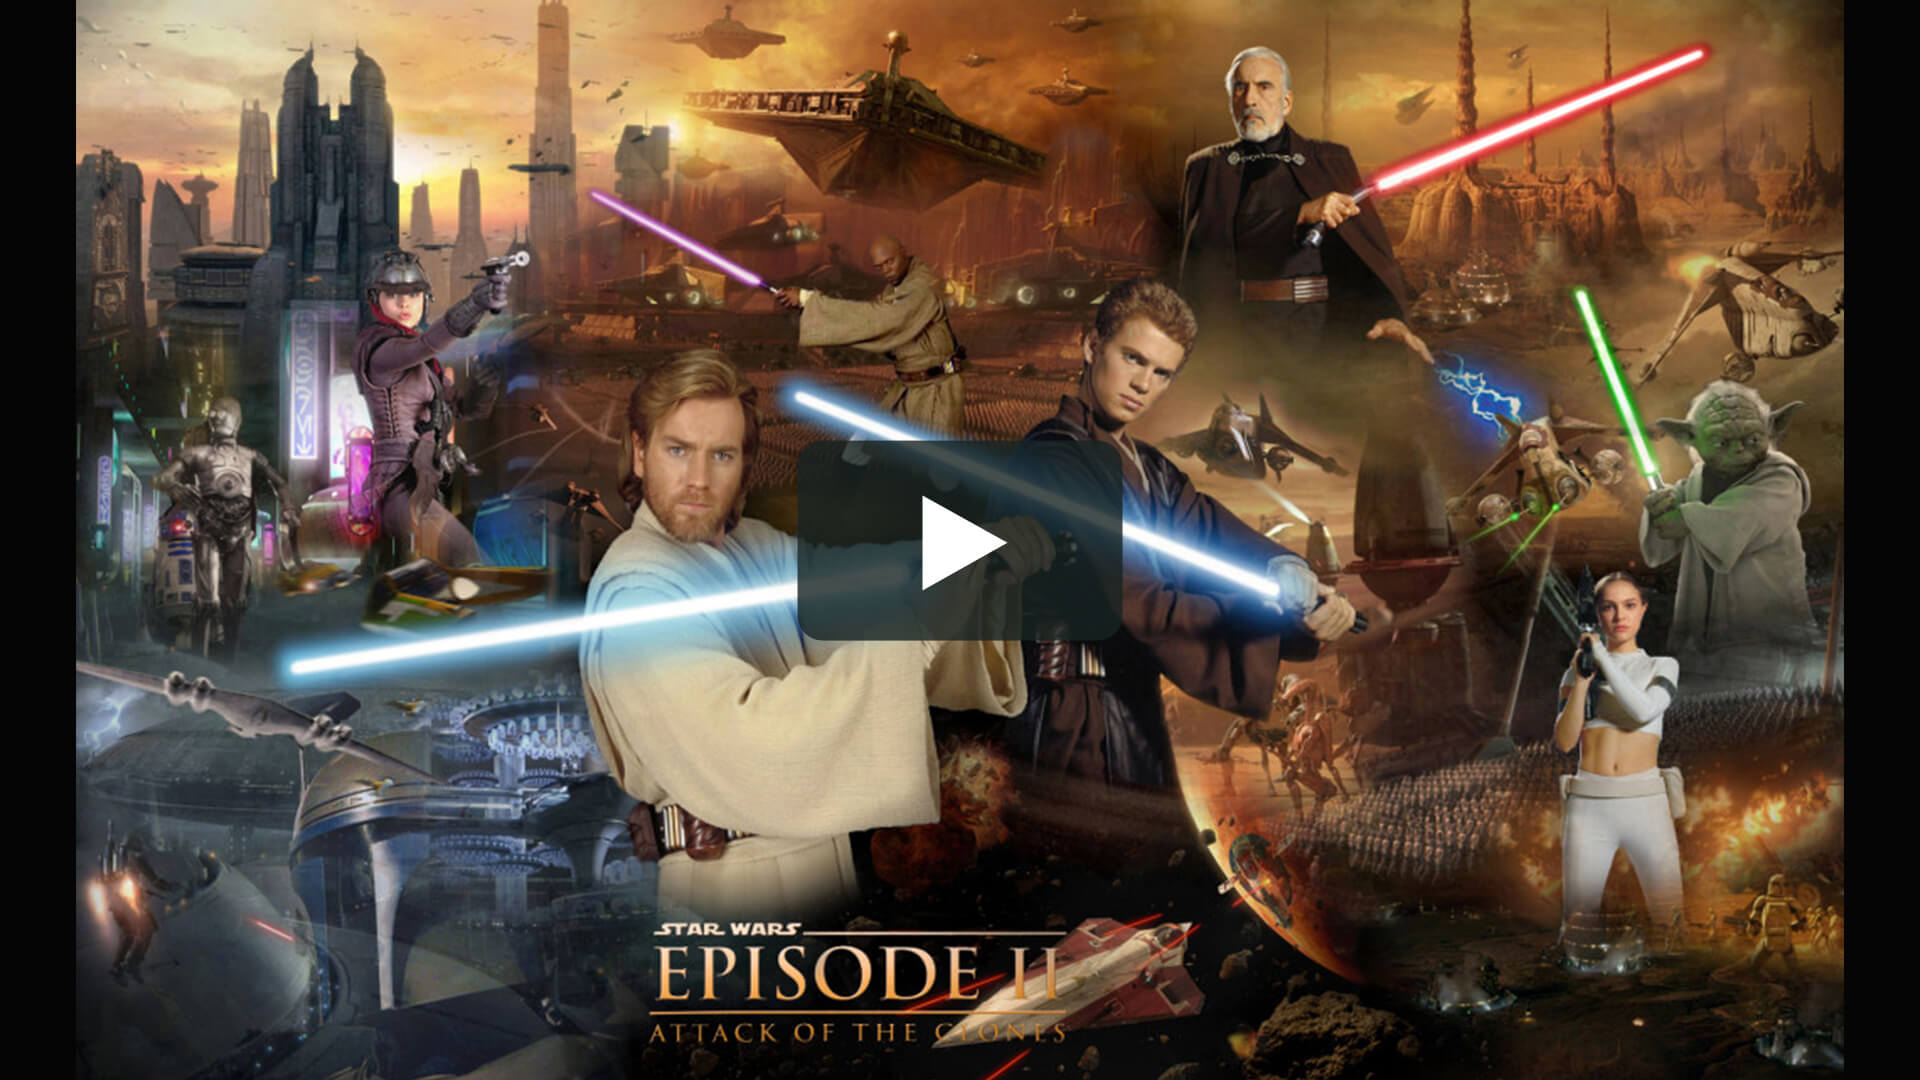 Star Wars: Episode II - Attack of the Clones - 星球大戰前傳2:克隆人的進攻